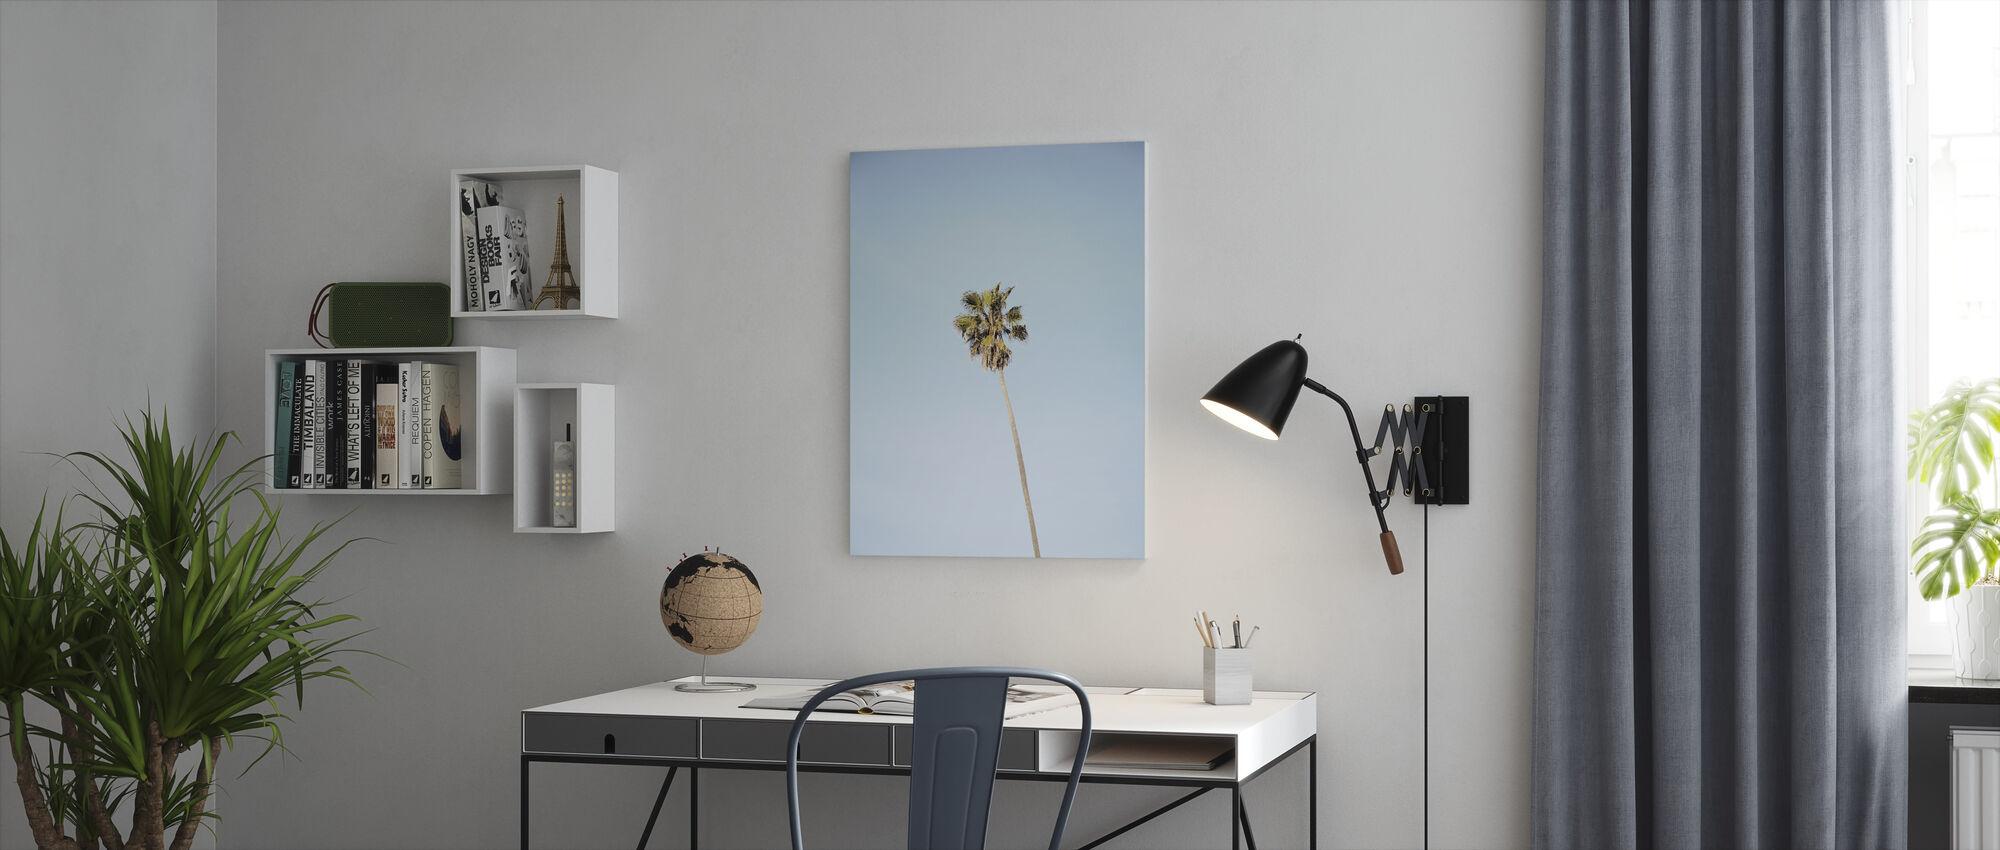 Endless Summer III - Canvas print - Office